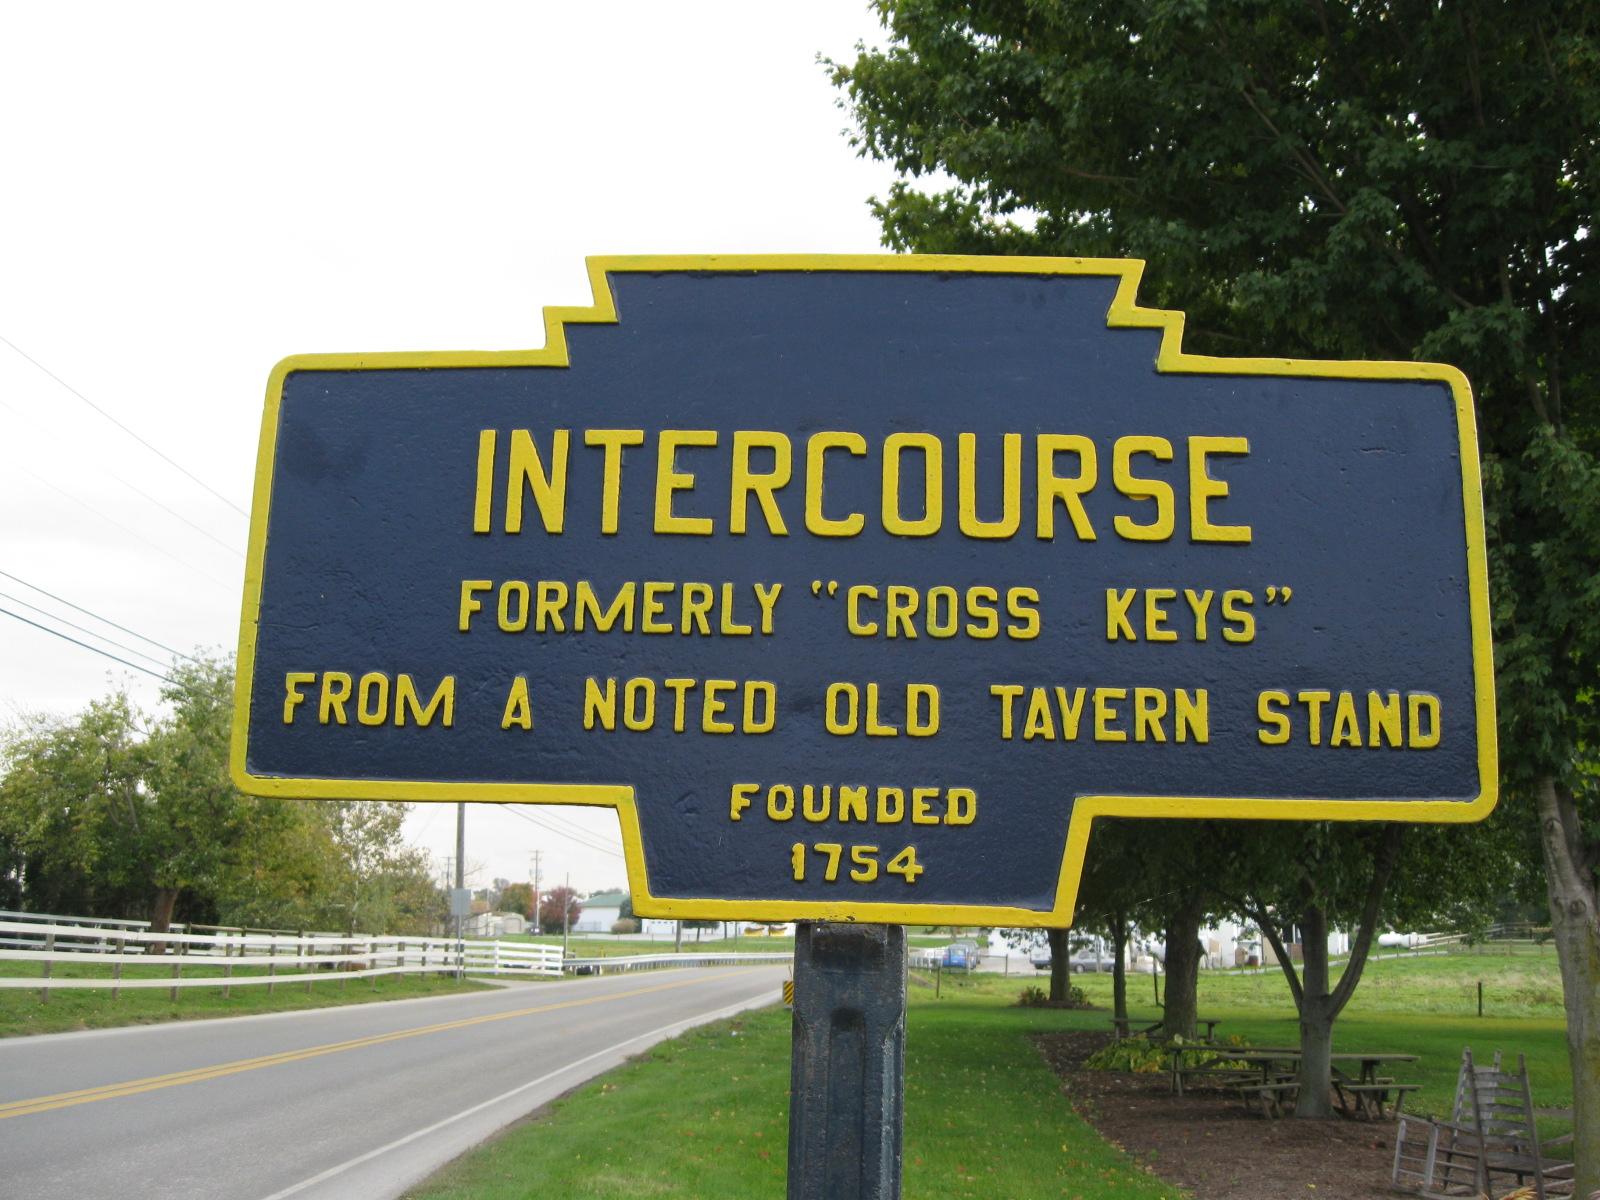 Keystone Marker in Intercourse, Pennsylvania